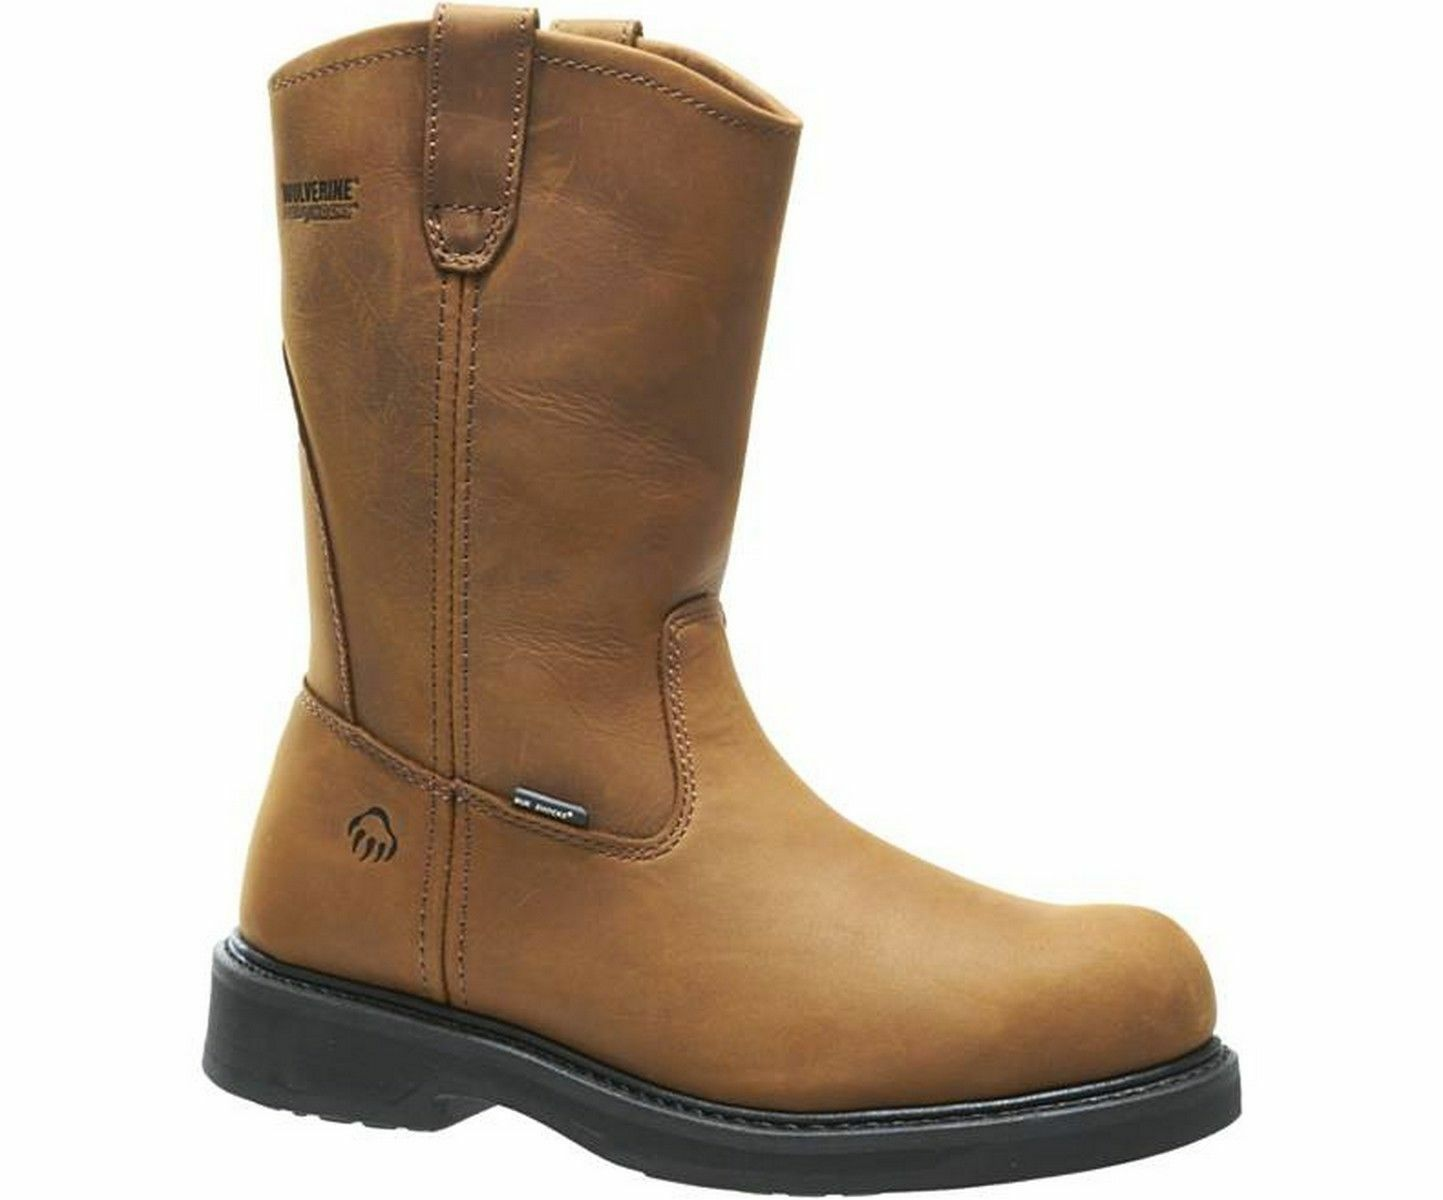 Wolverine Mens Ingham Well DuraShocks Steel Toe Work Boot NWB Size 8-13 W06683